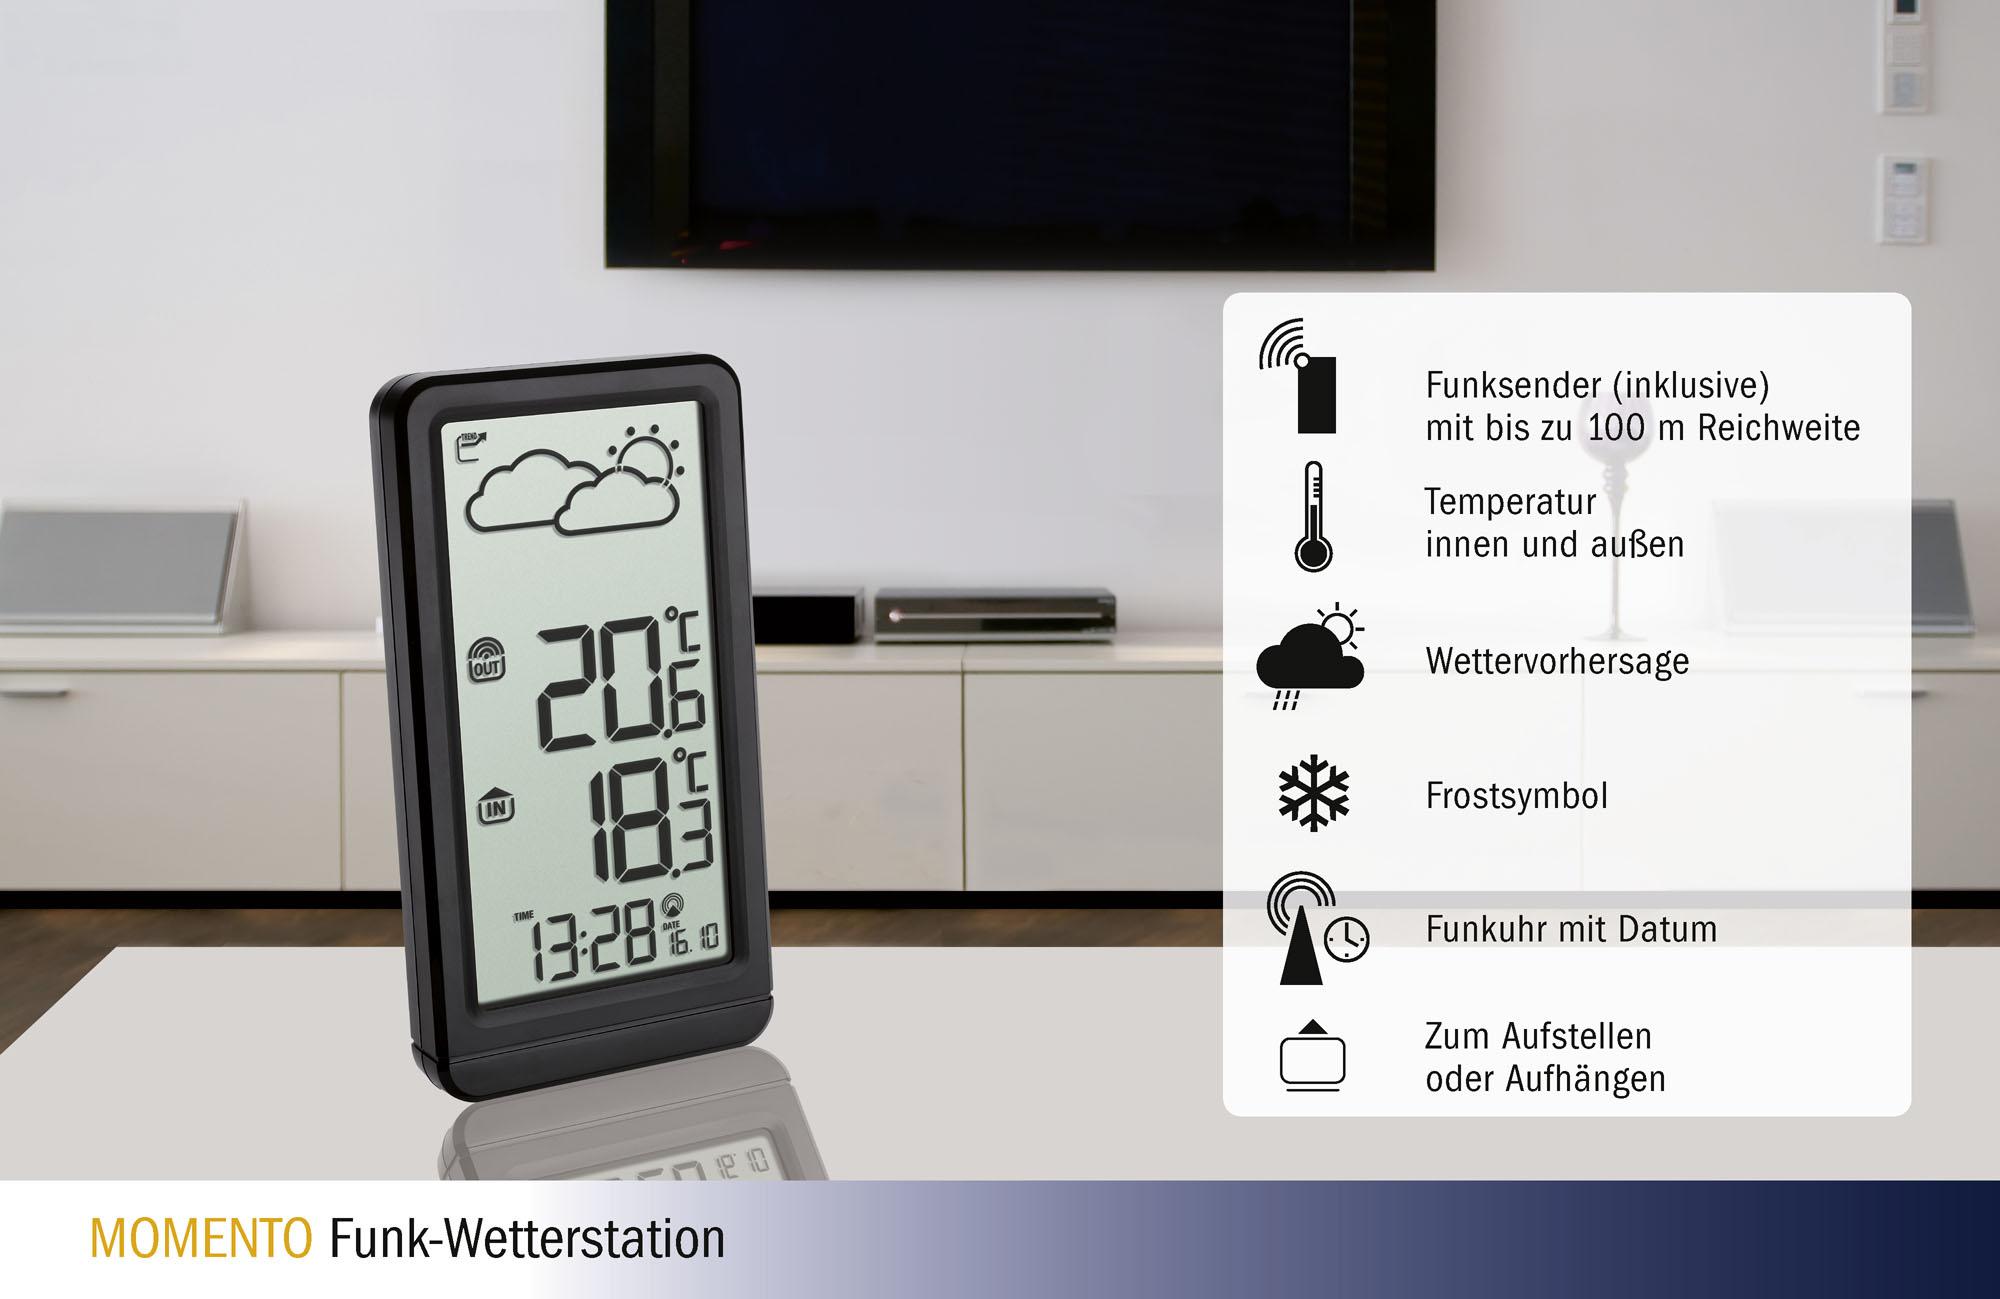 Funk-Wetterstation_351149_Icons.jpg